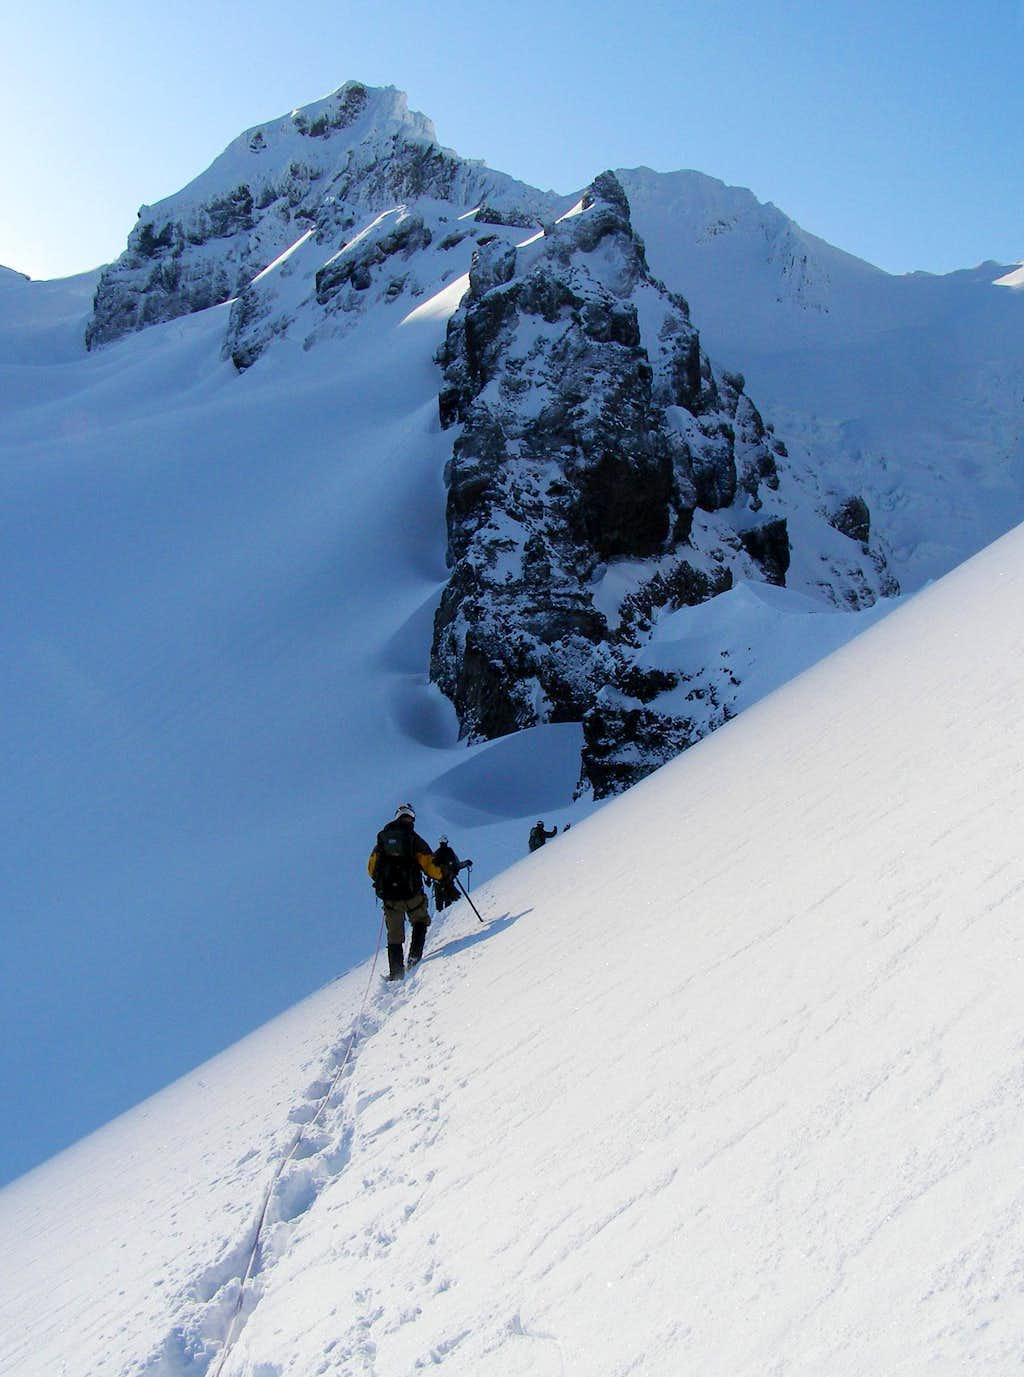 Approaching Colfax Peak